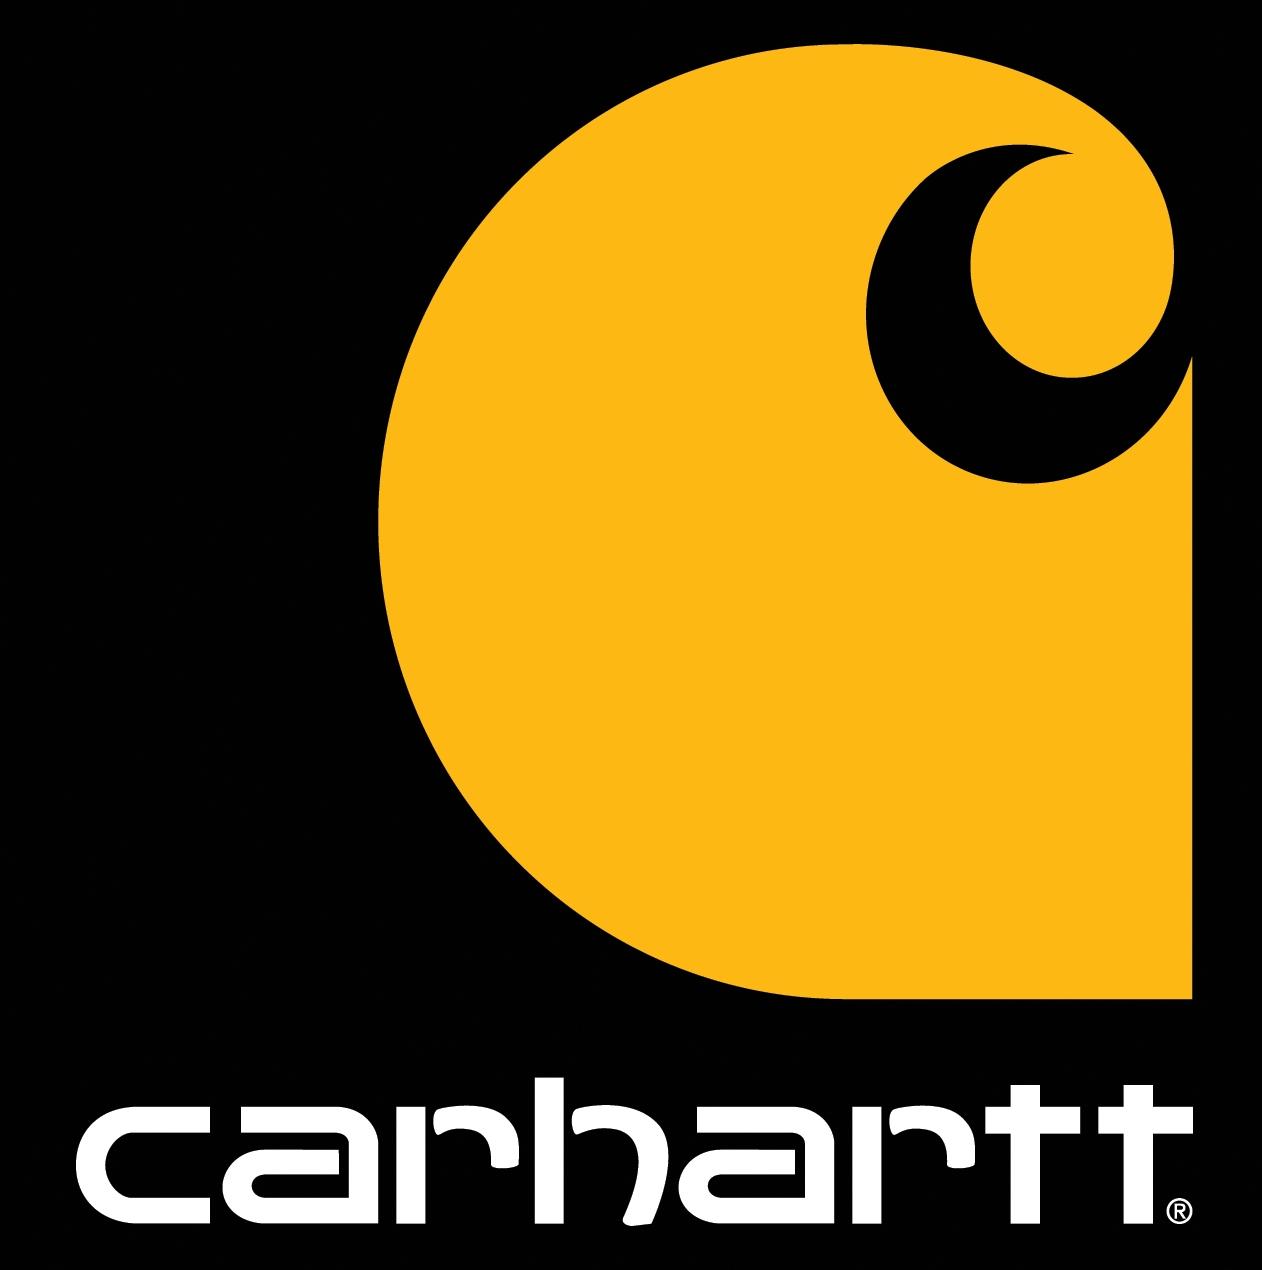 CarharttLogo.png